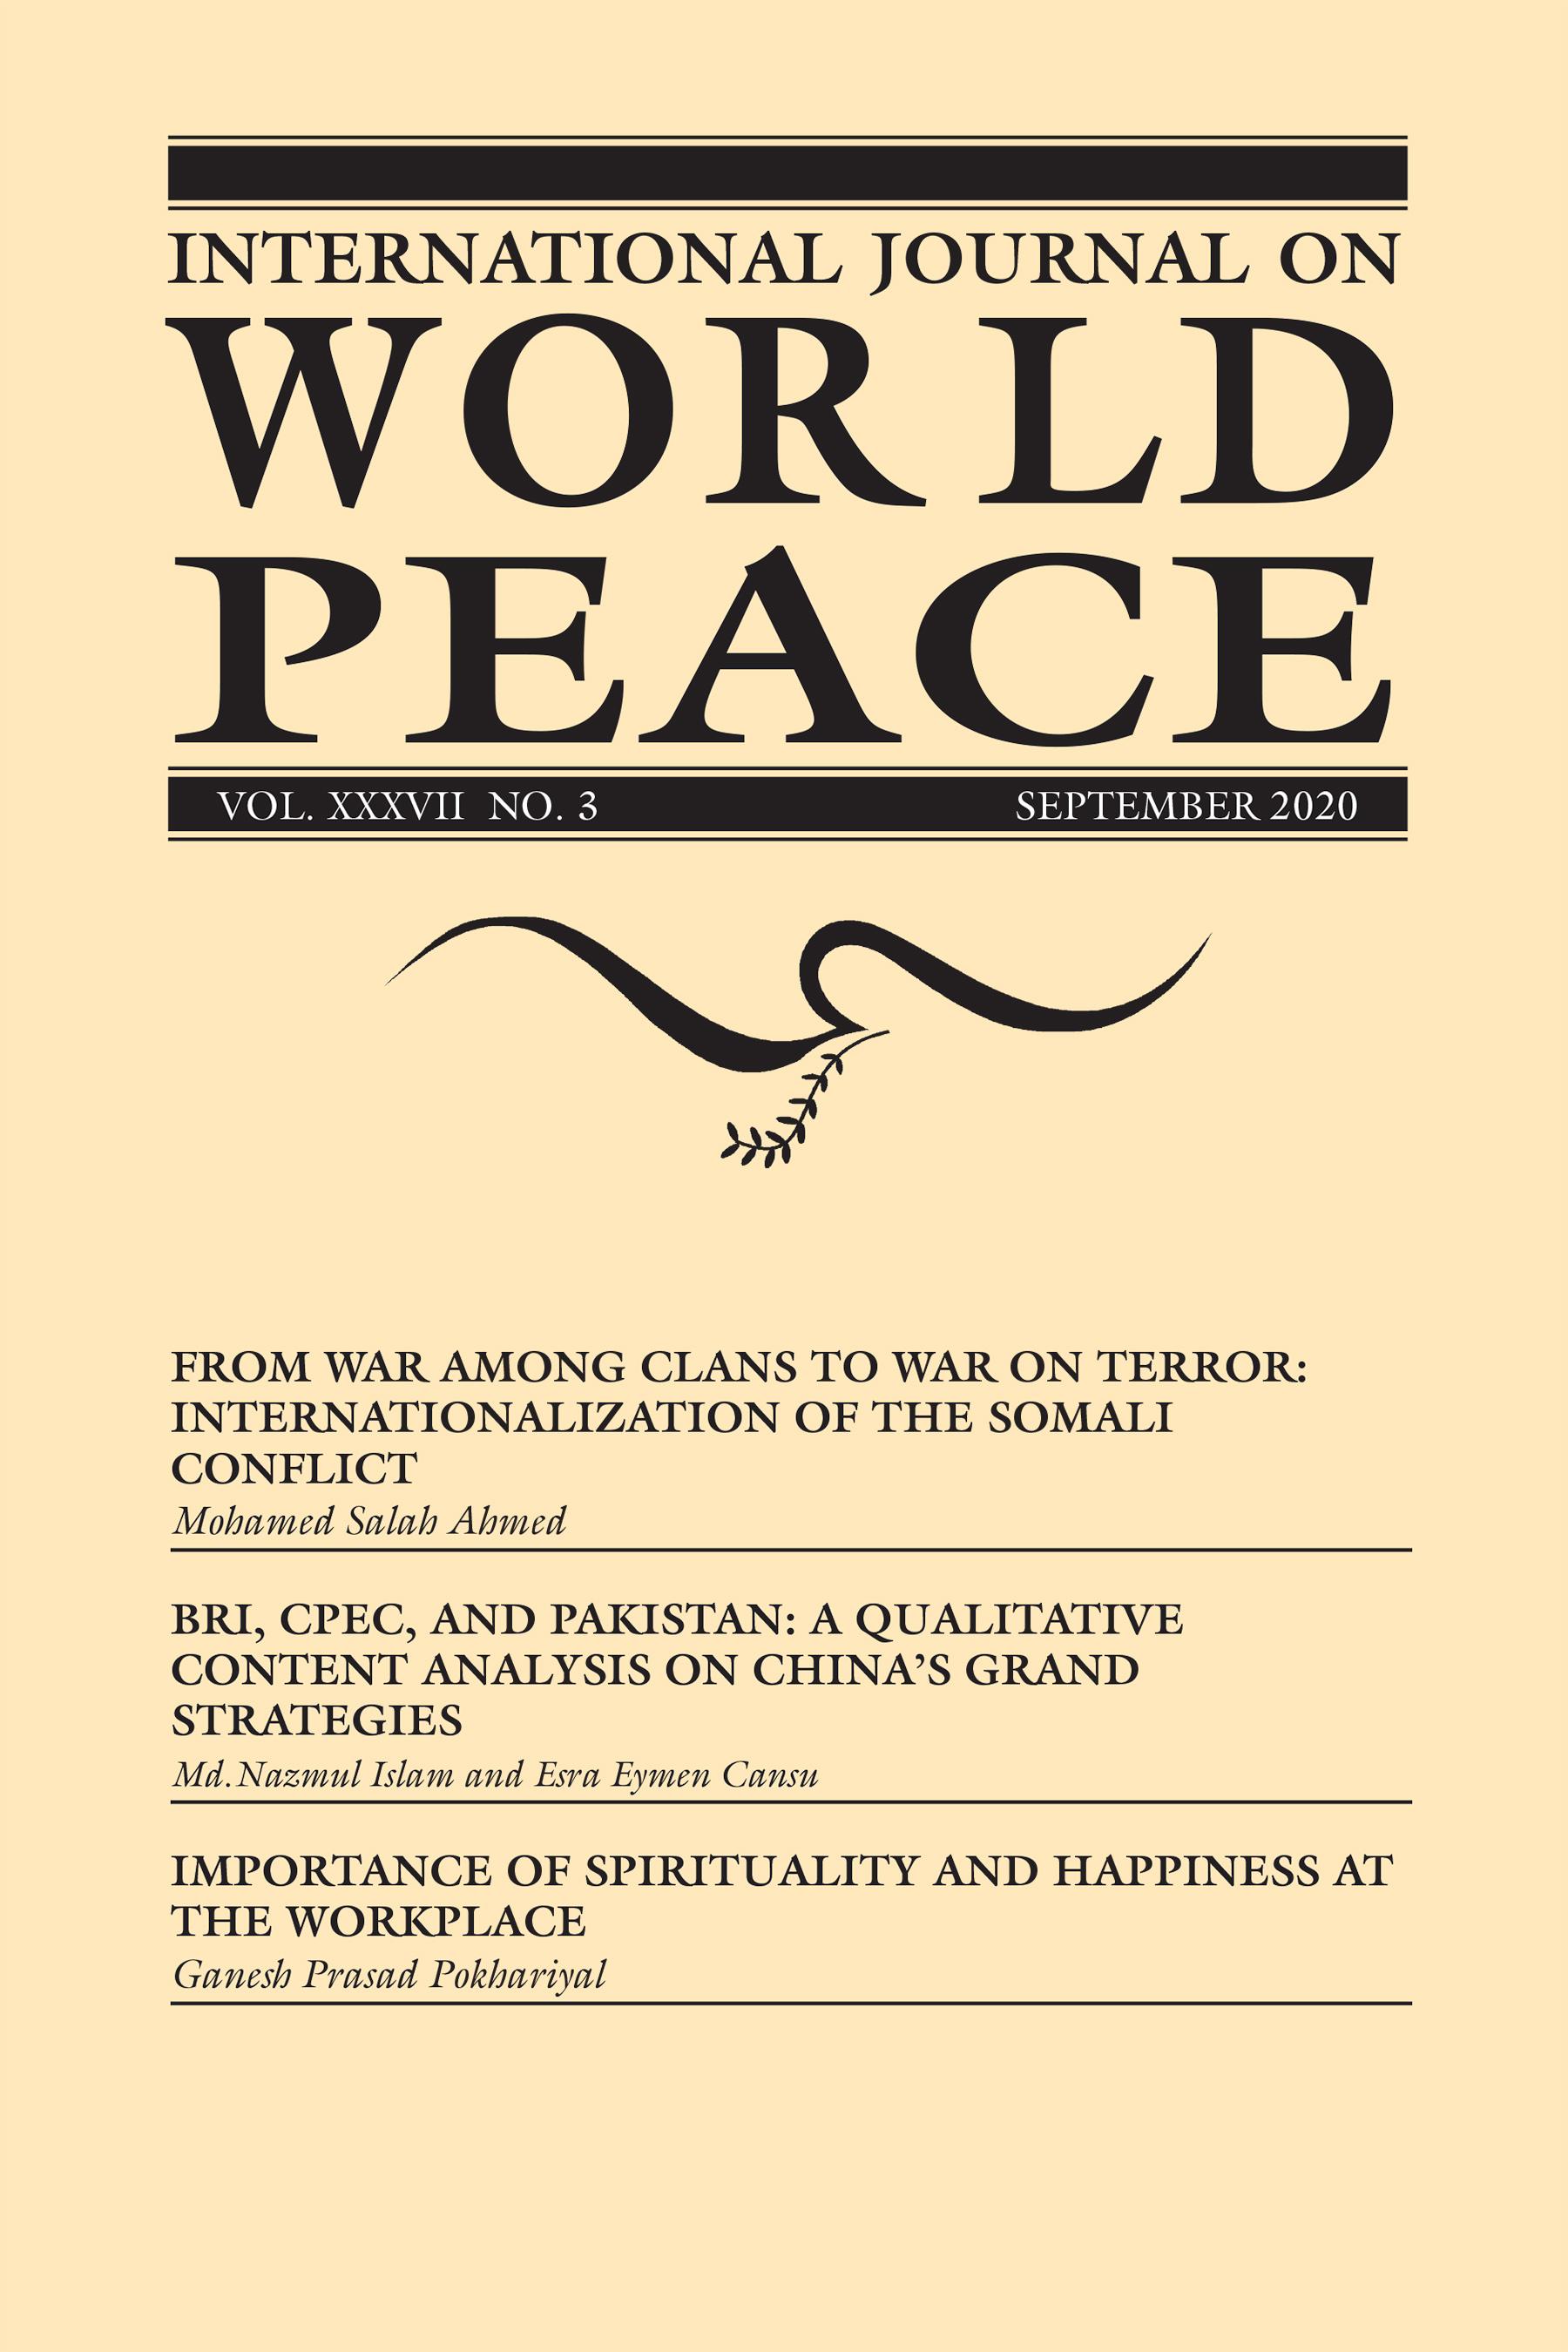 IJWP 37:3, September 2020, pdf